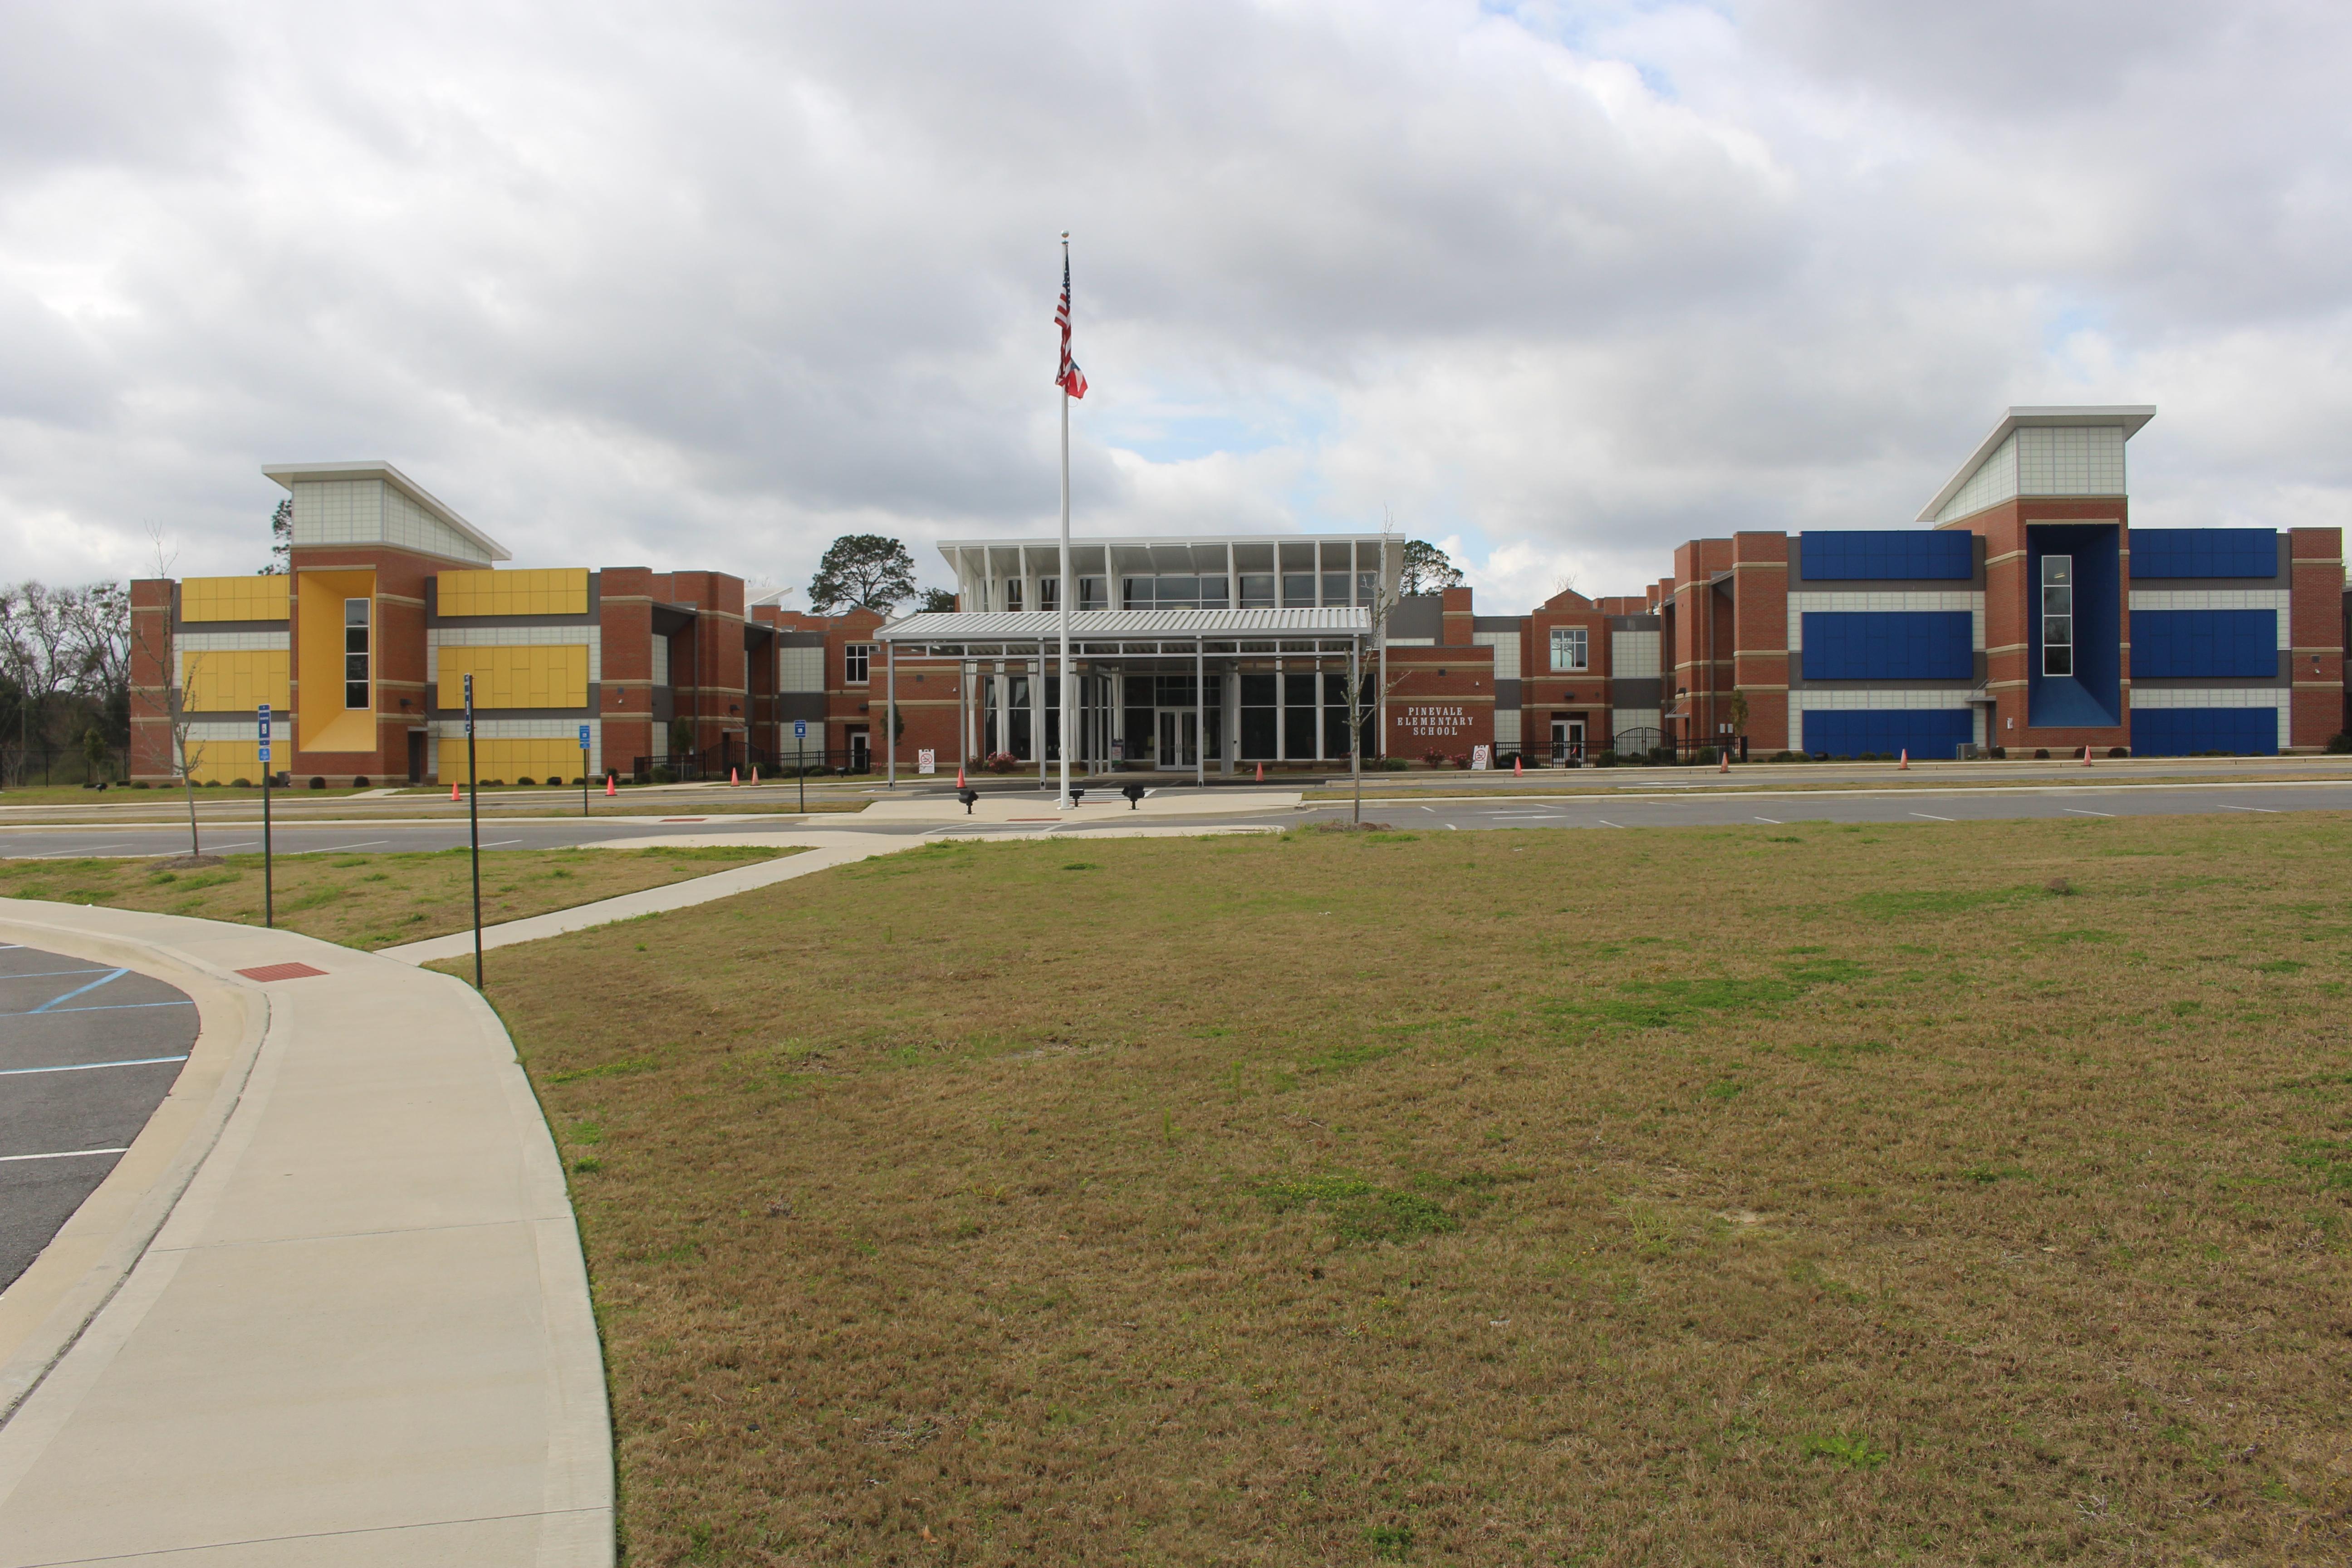 File:Pinevale Elementary School, Valdosta.jpg